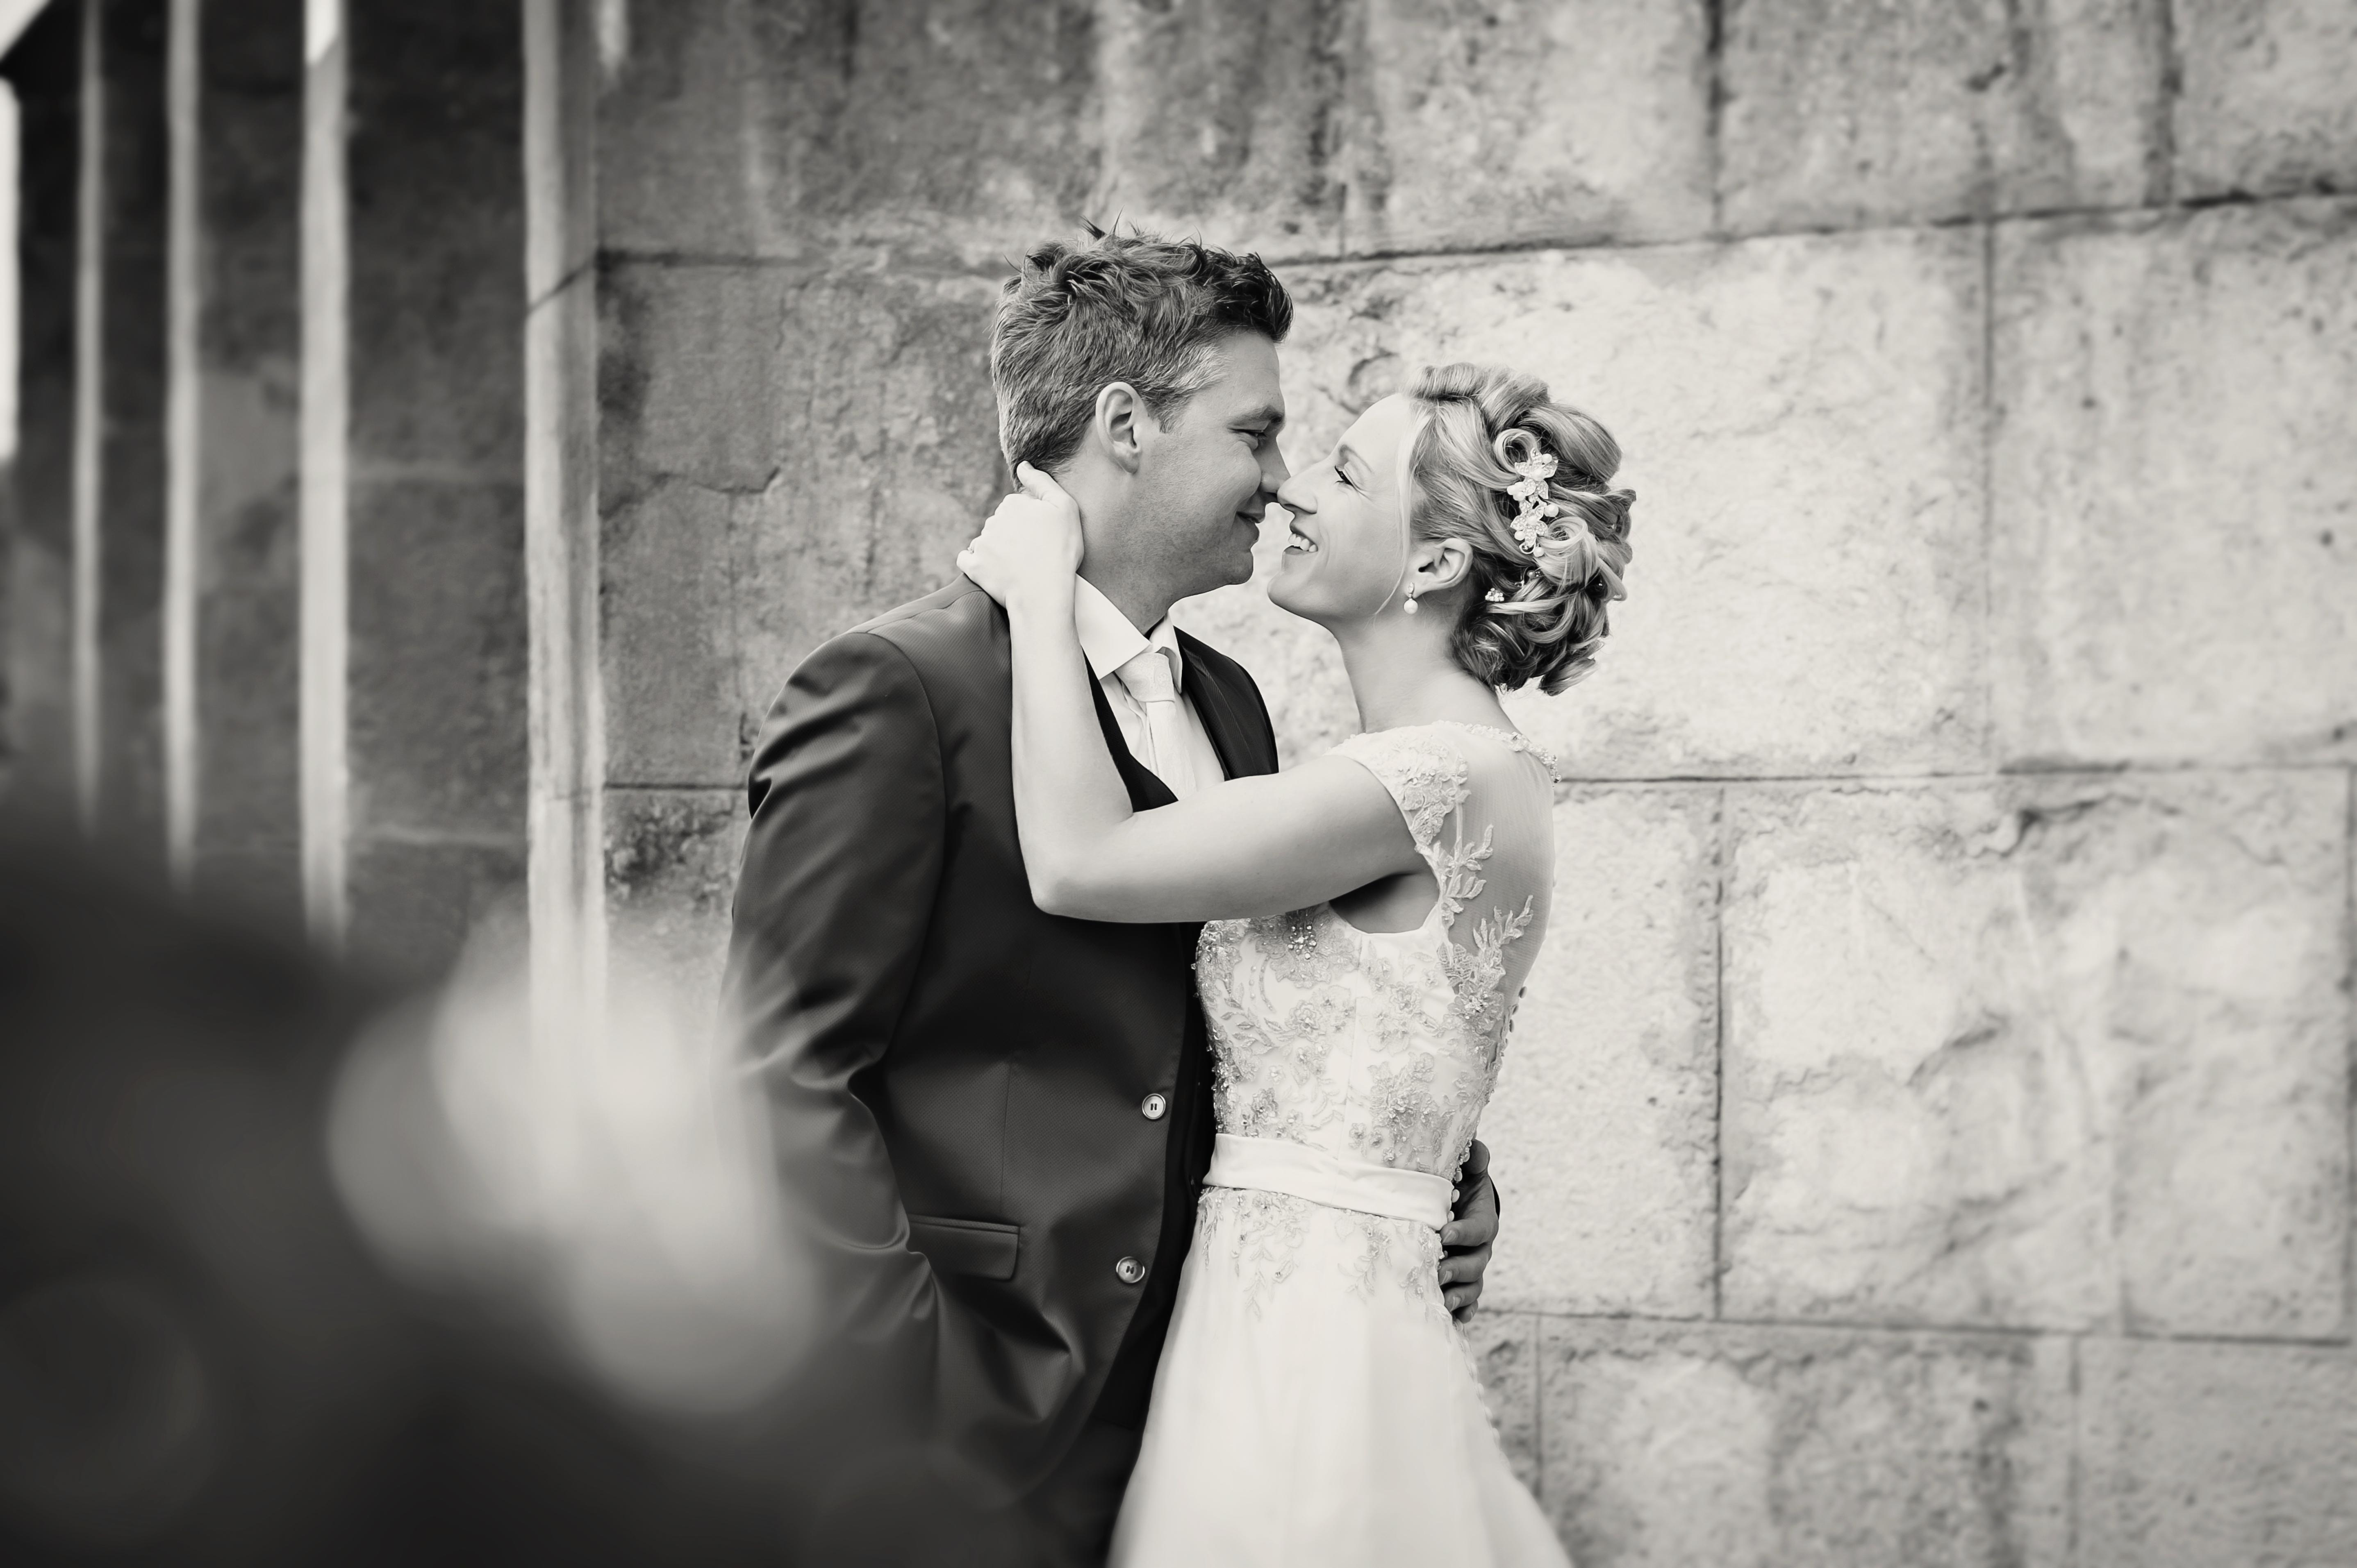 ElsnerFotografie_Hochzeitspaarportraits_C&G_DSC_3577_sw